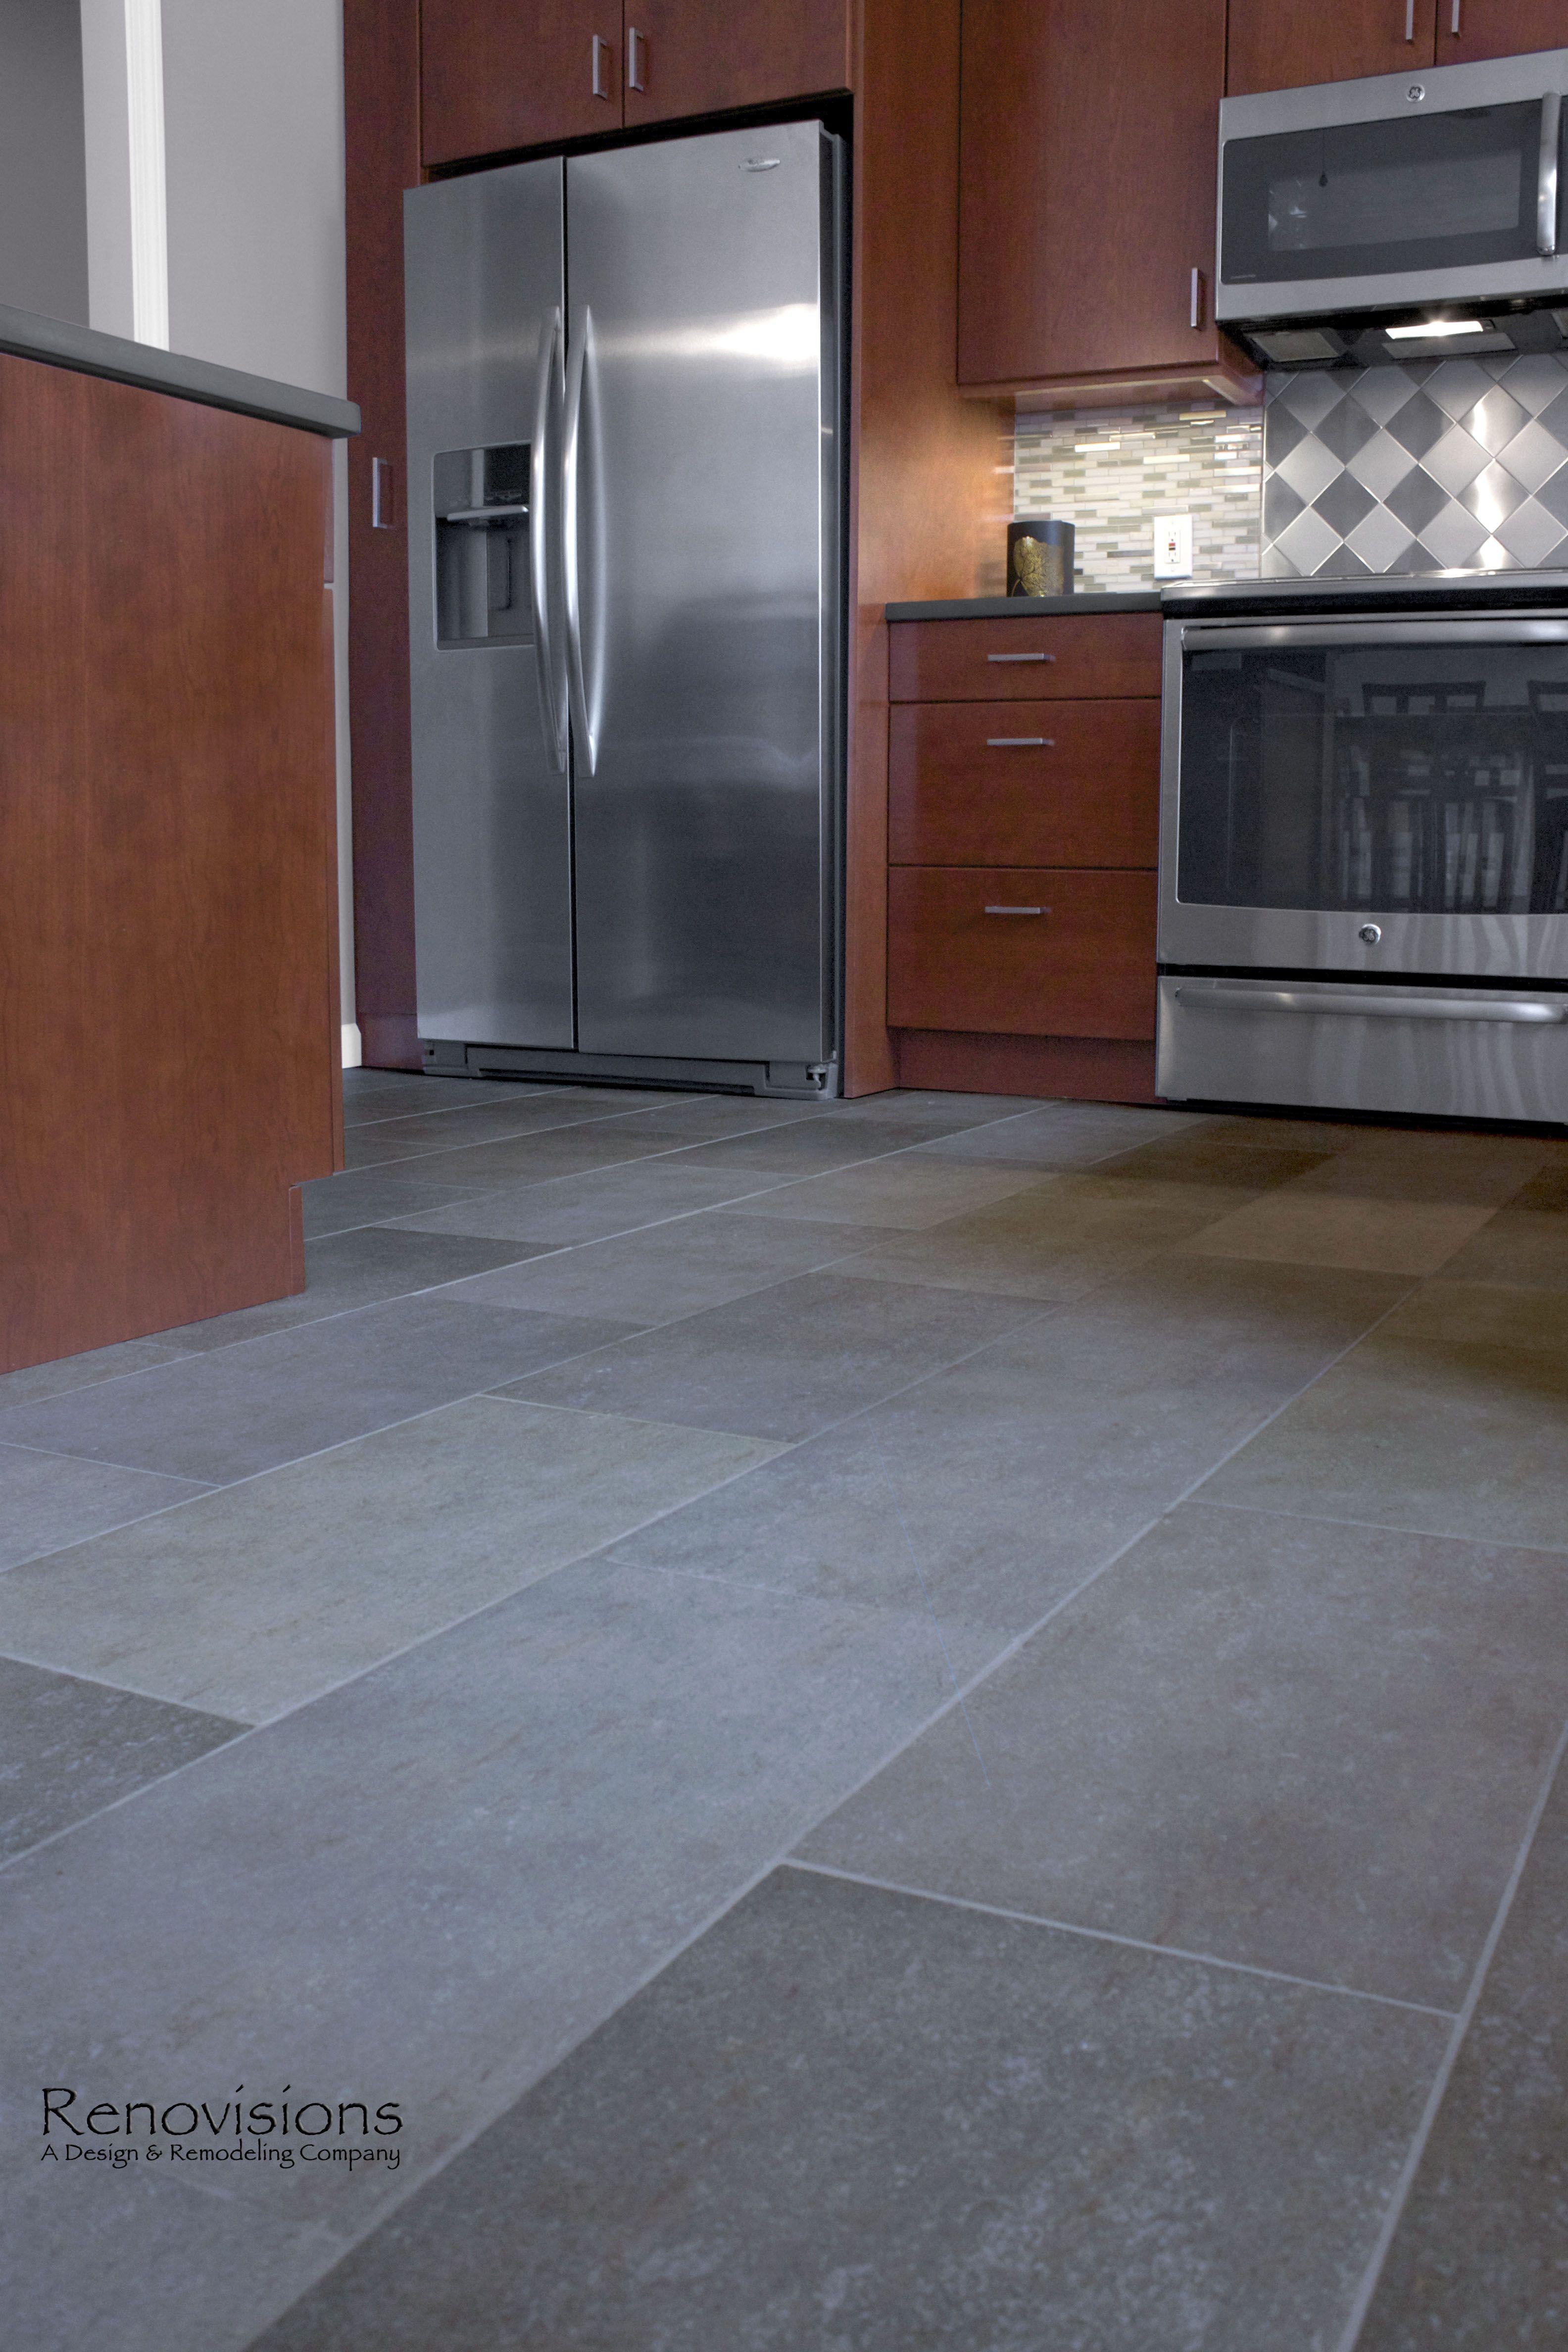 Steel Backsplash Kitchen Contemporary Kitchen Remodel By Renovisions Stainless Steel